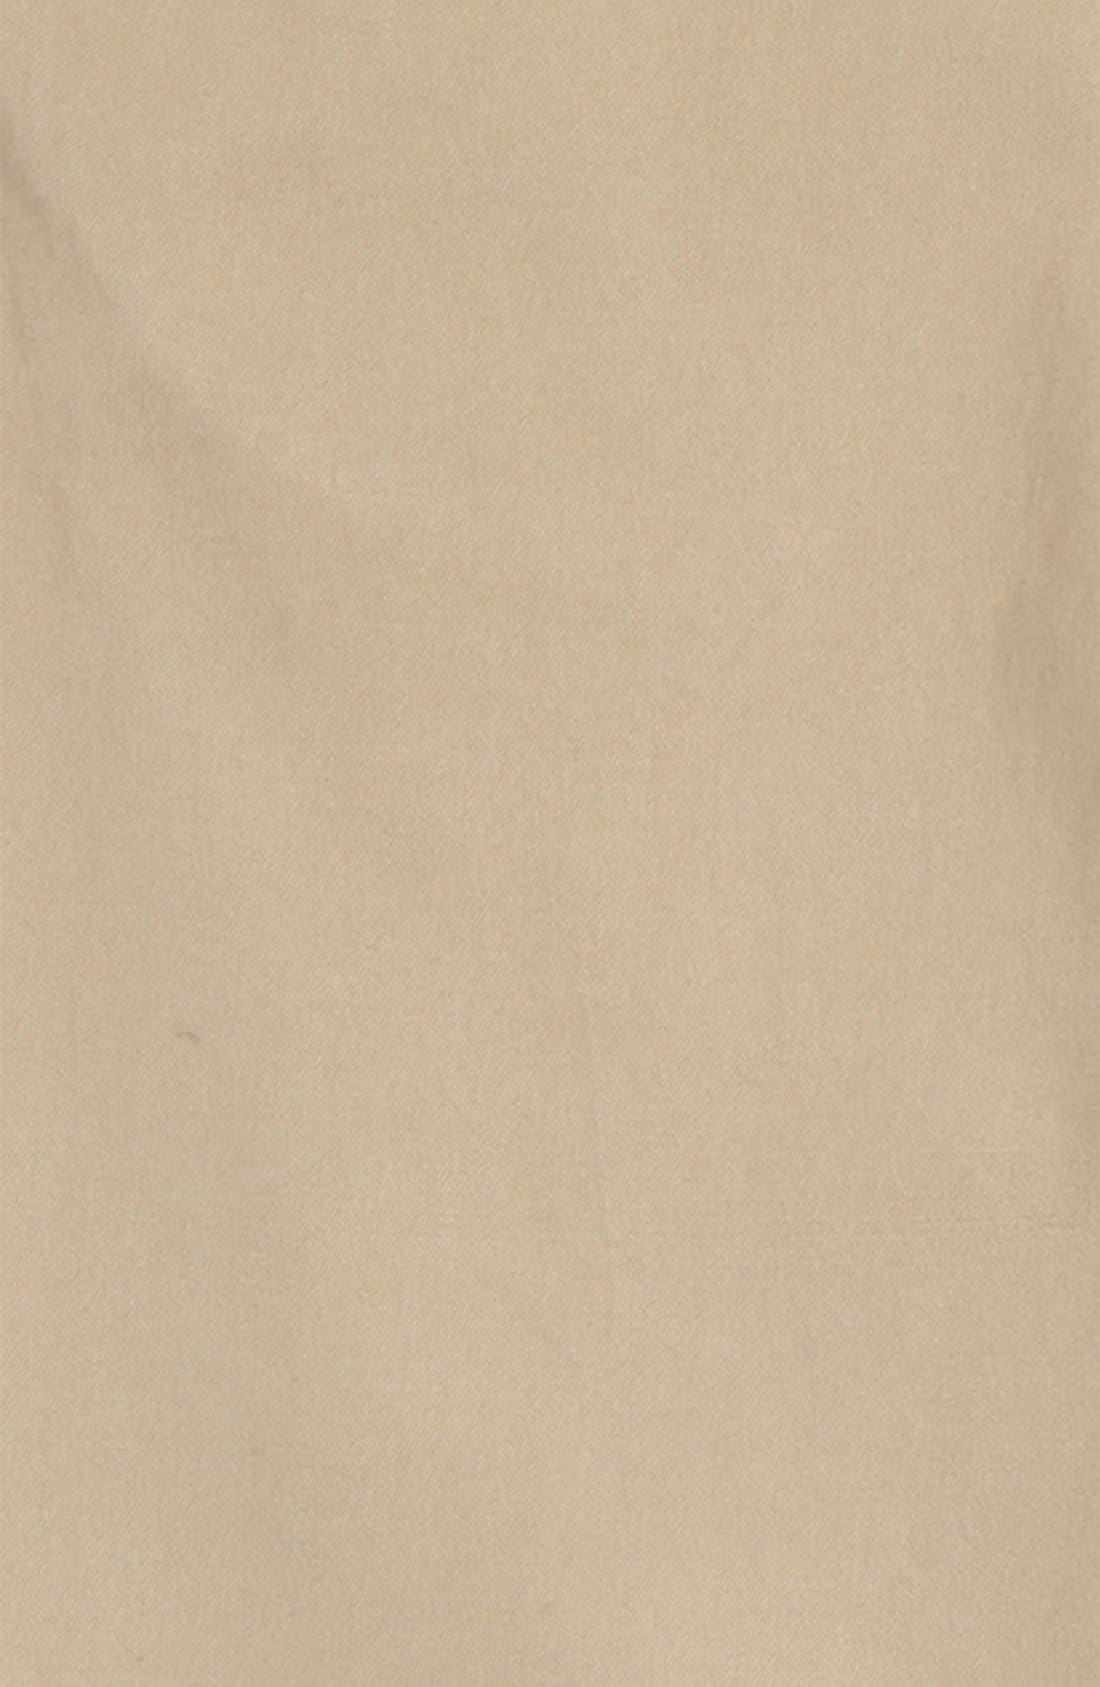 Club Cotton Twill Pants,                             Alternate thumbnail 3, color,